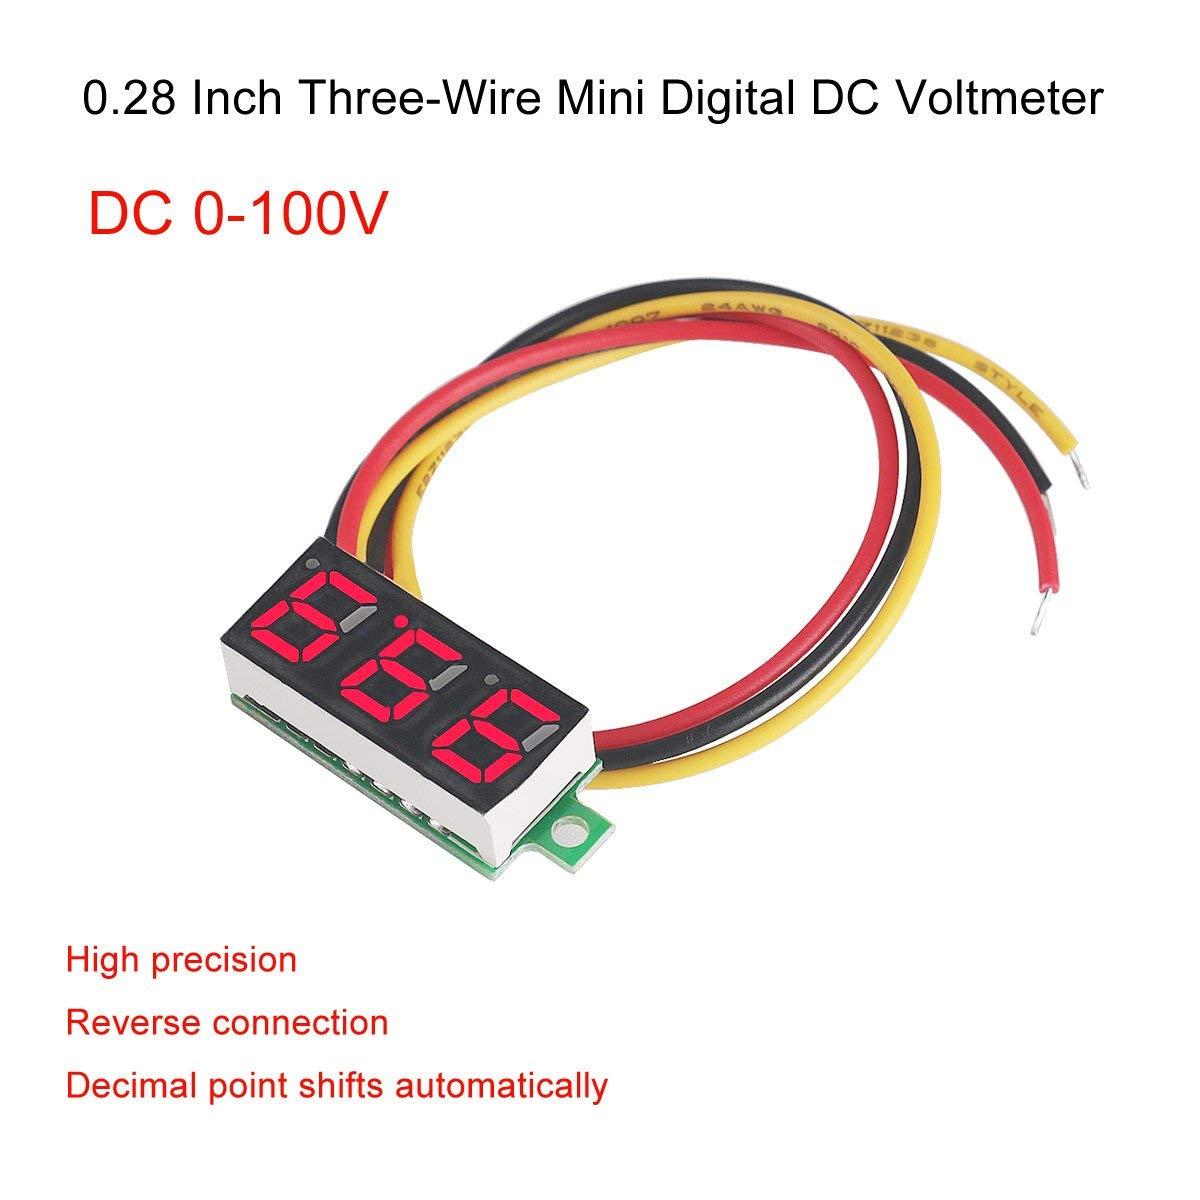 MakerHawk 4pcs Digital DC Voltmeter 0.56 inch Three-Lines 0-100V Digital Voltmeter Gauge Tester LED Display Reverse Polarity Protection and Accurate Pressure Measurement 4 Colours